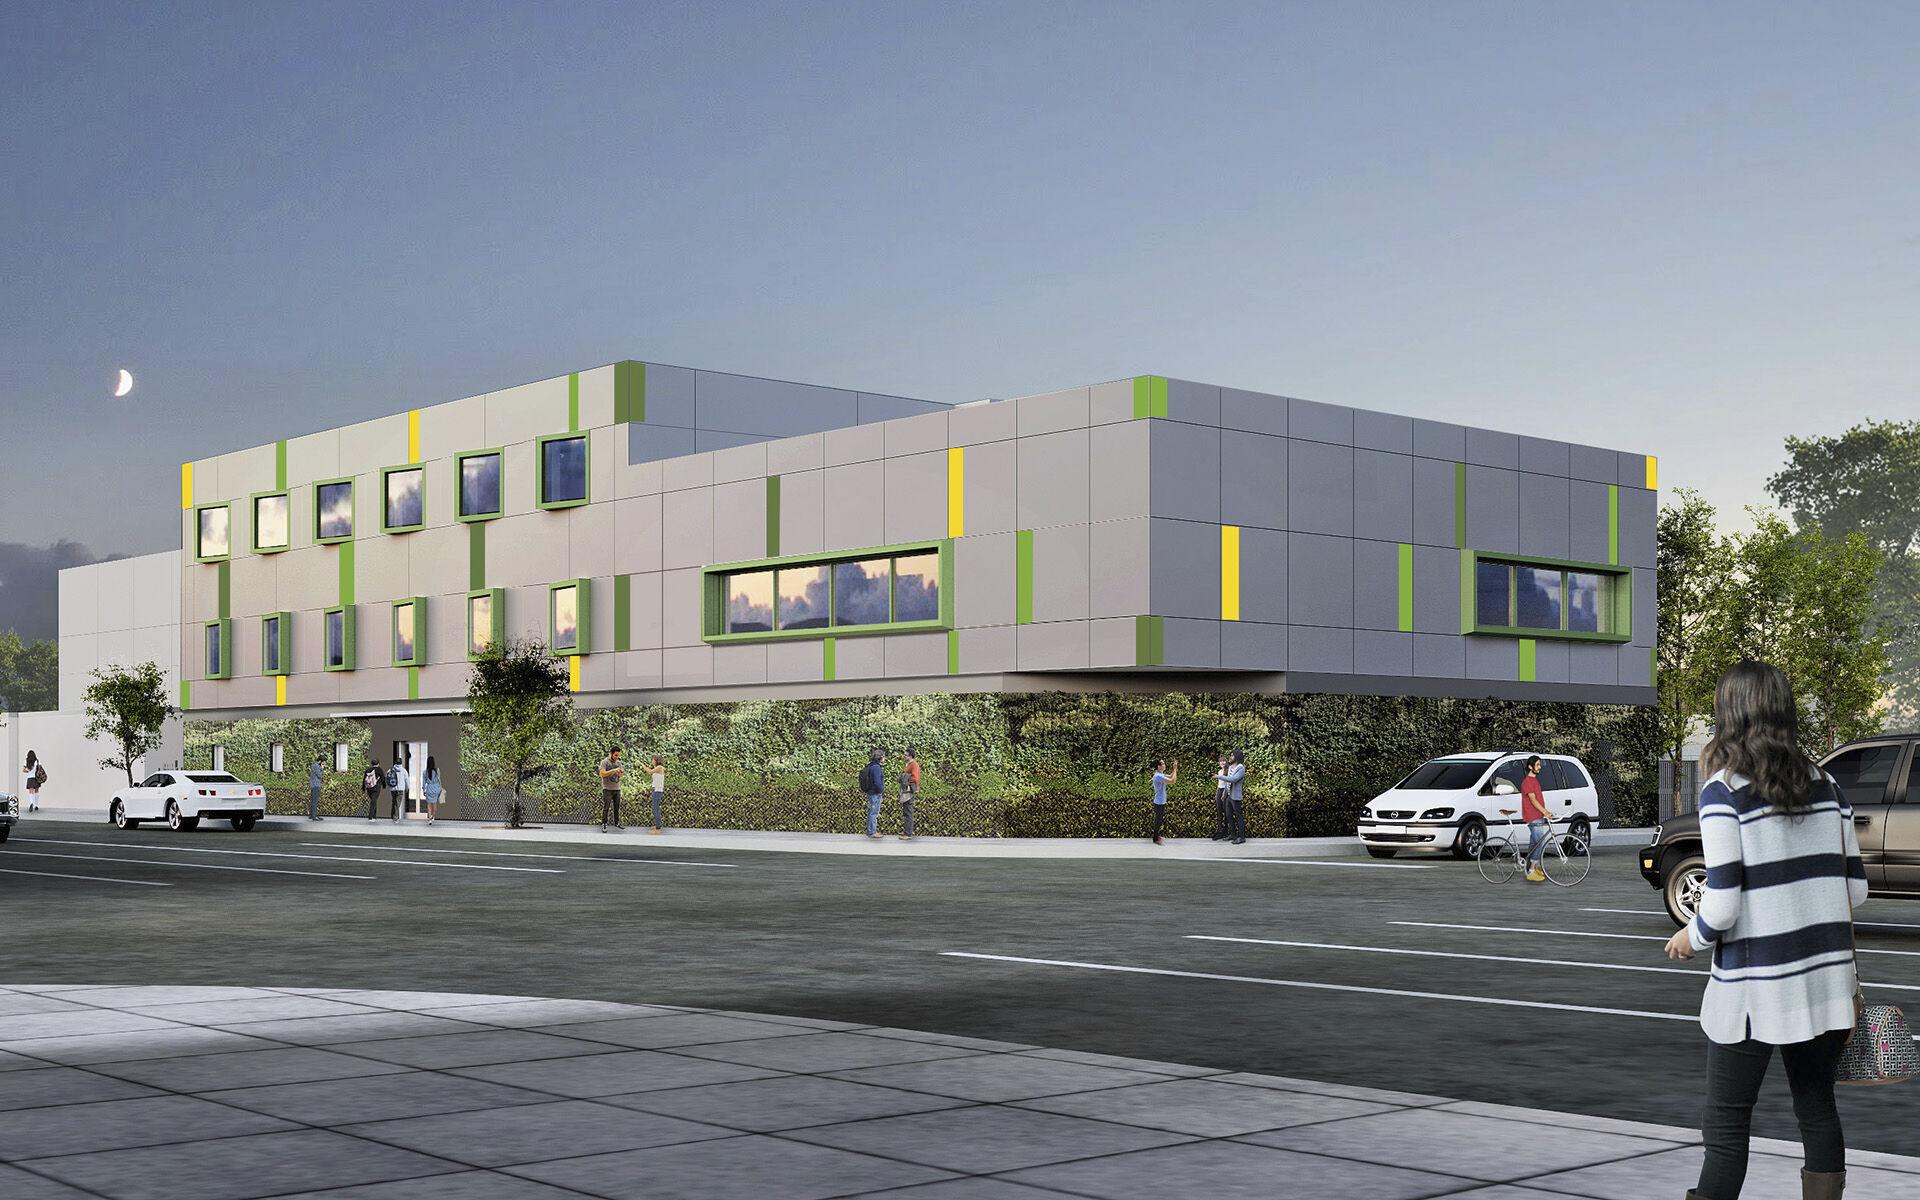 KIPP Academy of Innovation